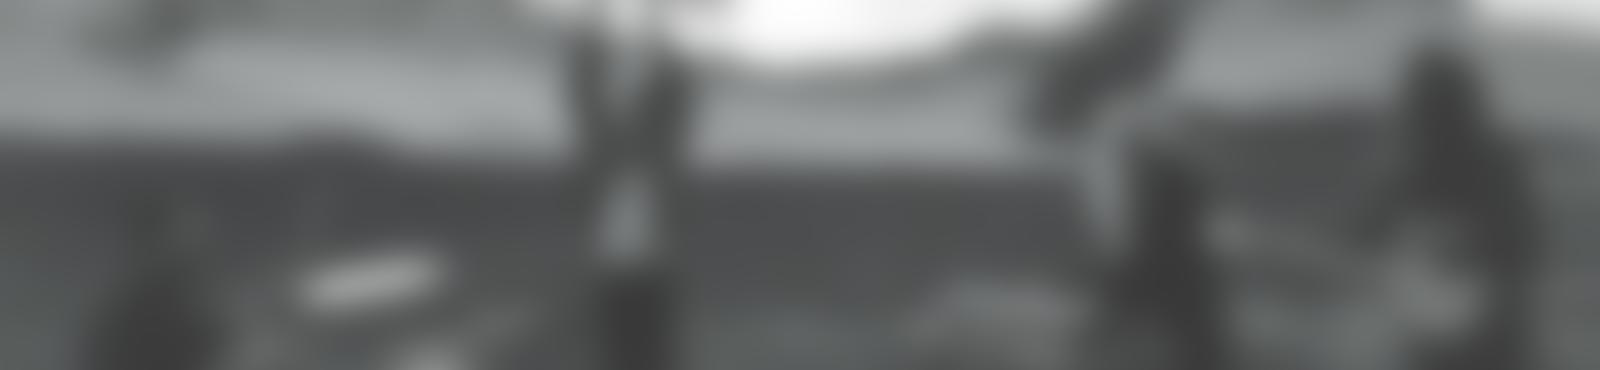 Blurred ceb77db2 3ee1 4dad b068 2450bea7a203